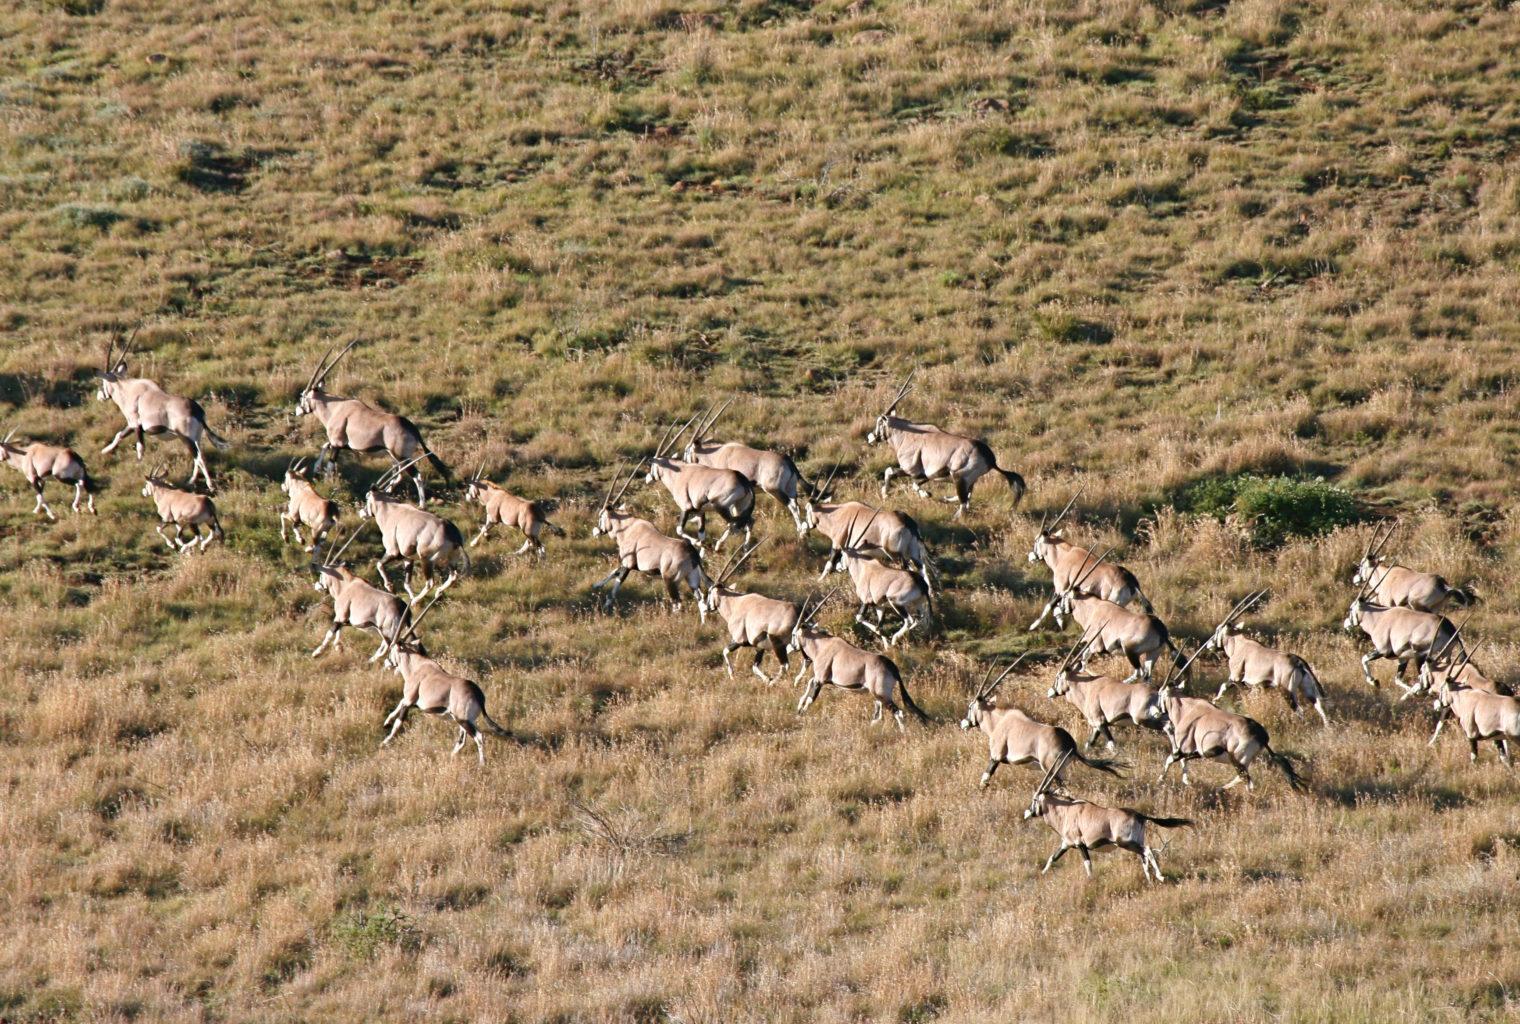 Oryx in flight in The Great Karoo